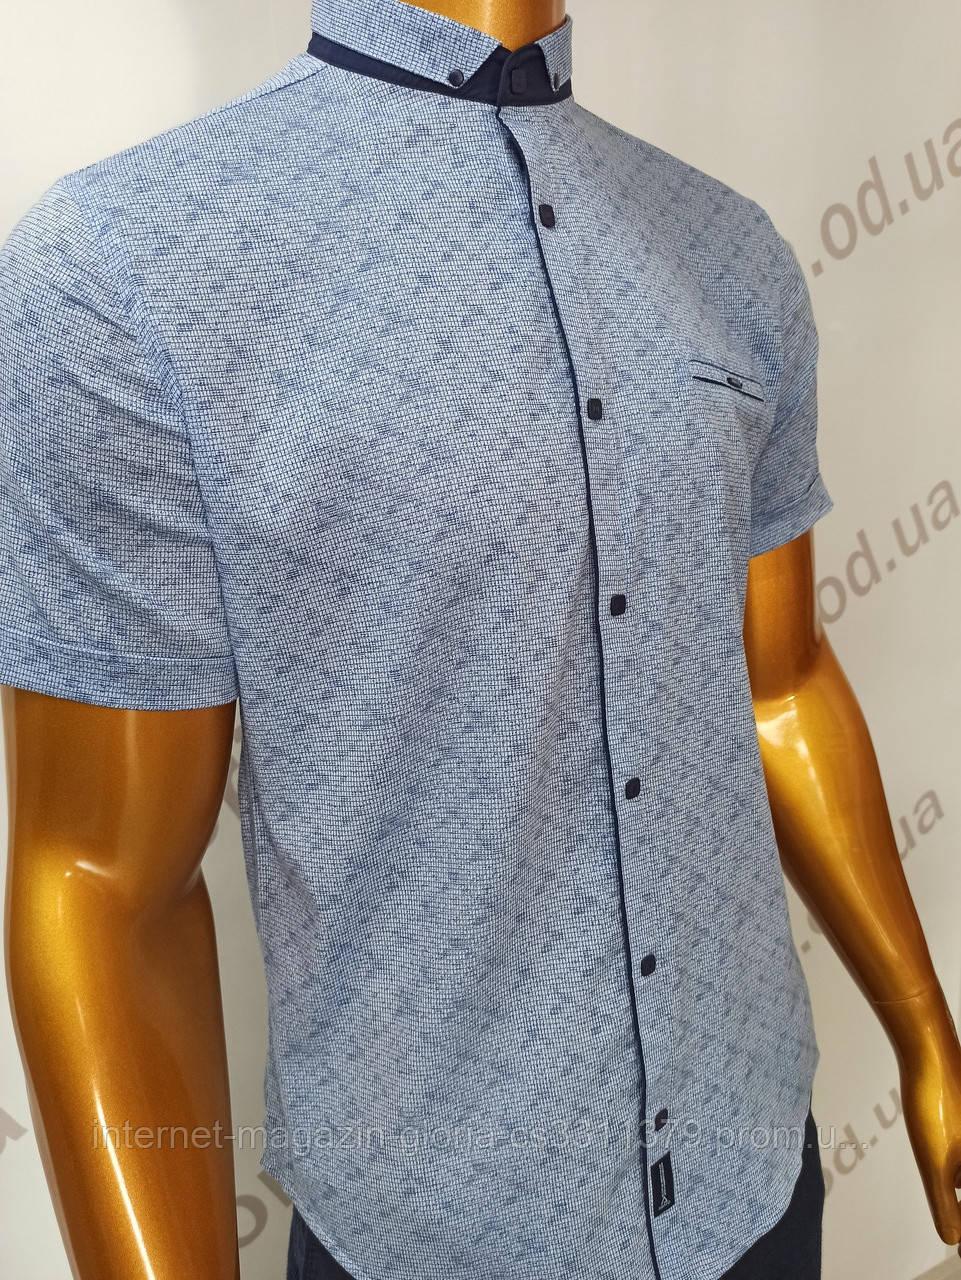 Мужская рубашка Amato. AG.19726-2(g). Размеры:L,XL(2), XXL.